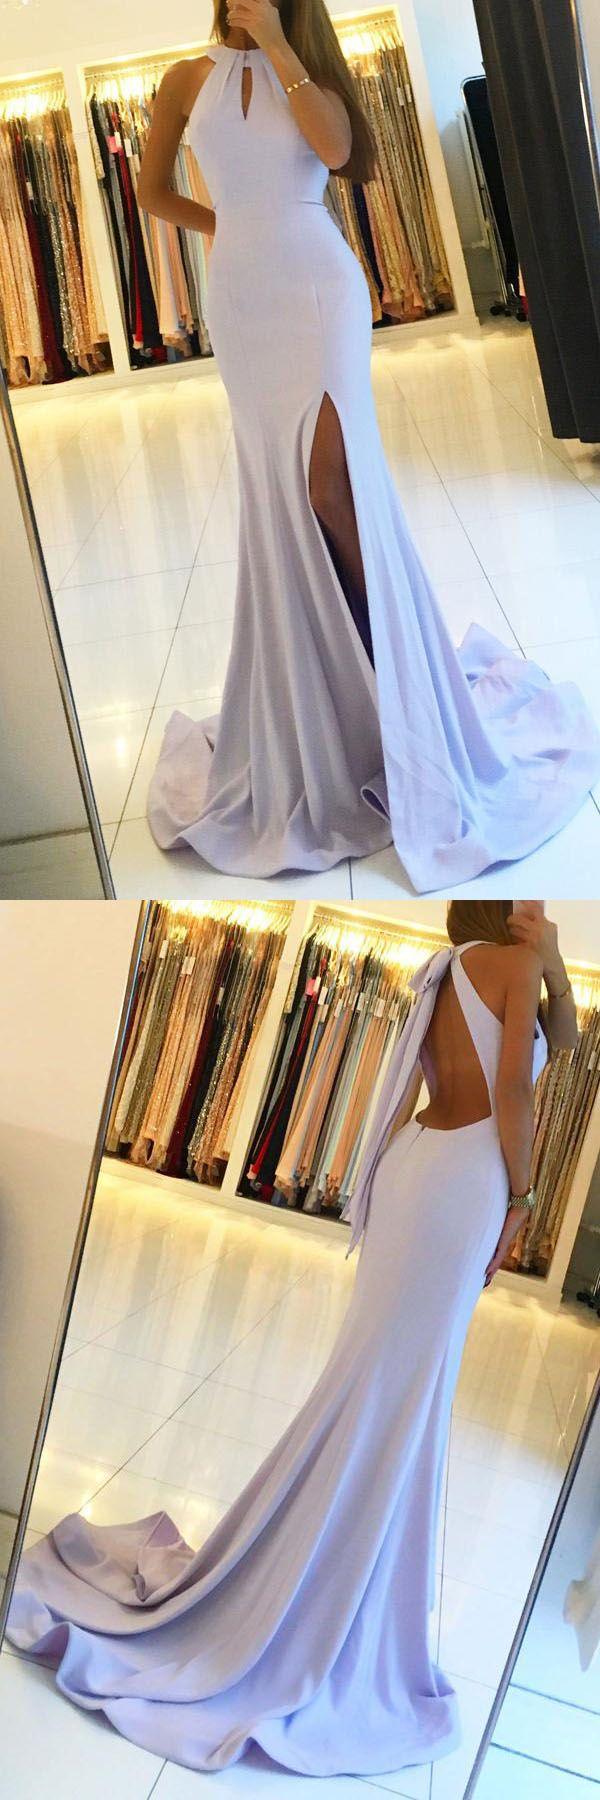 Mermaid Split Front Long Prom/Evening Dress #promdresses #longpromdresses #2018promdresses #eveningdresses #mermaidpromdresses